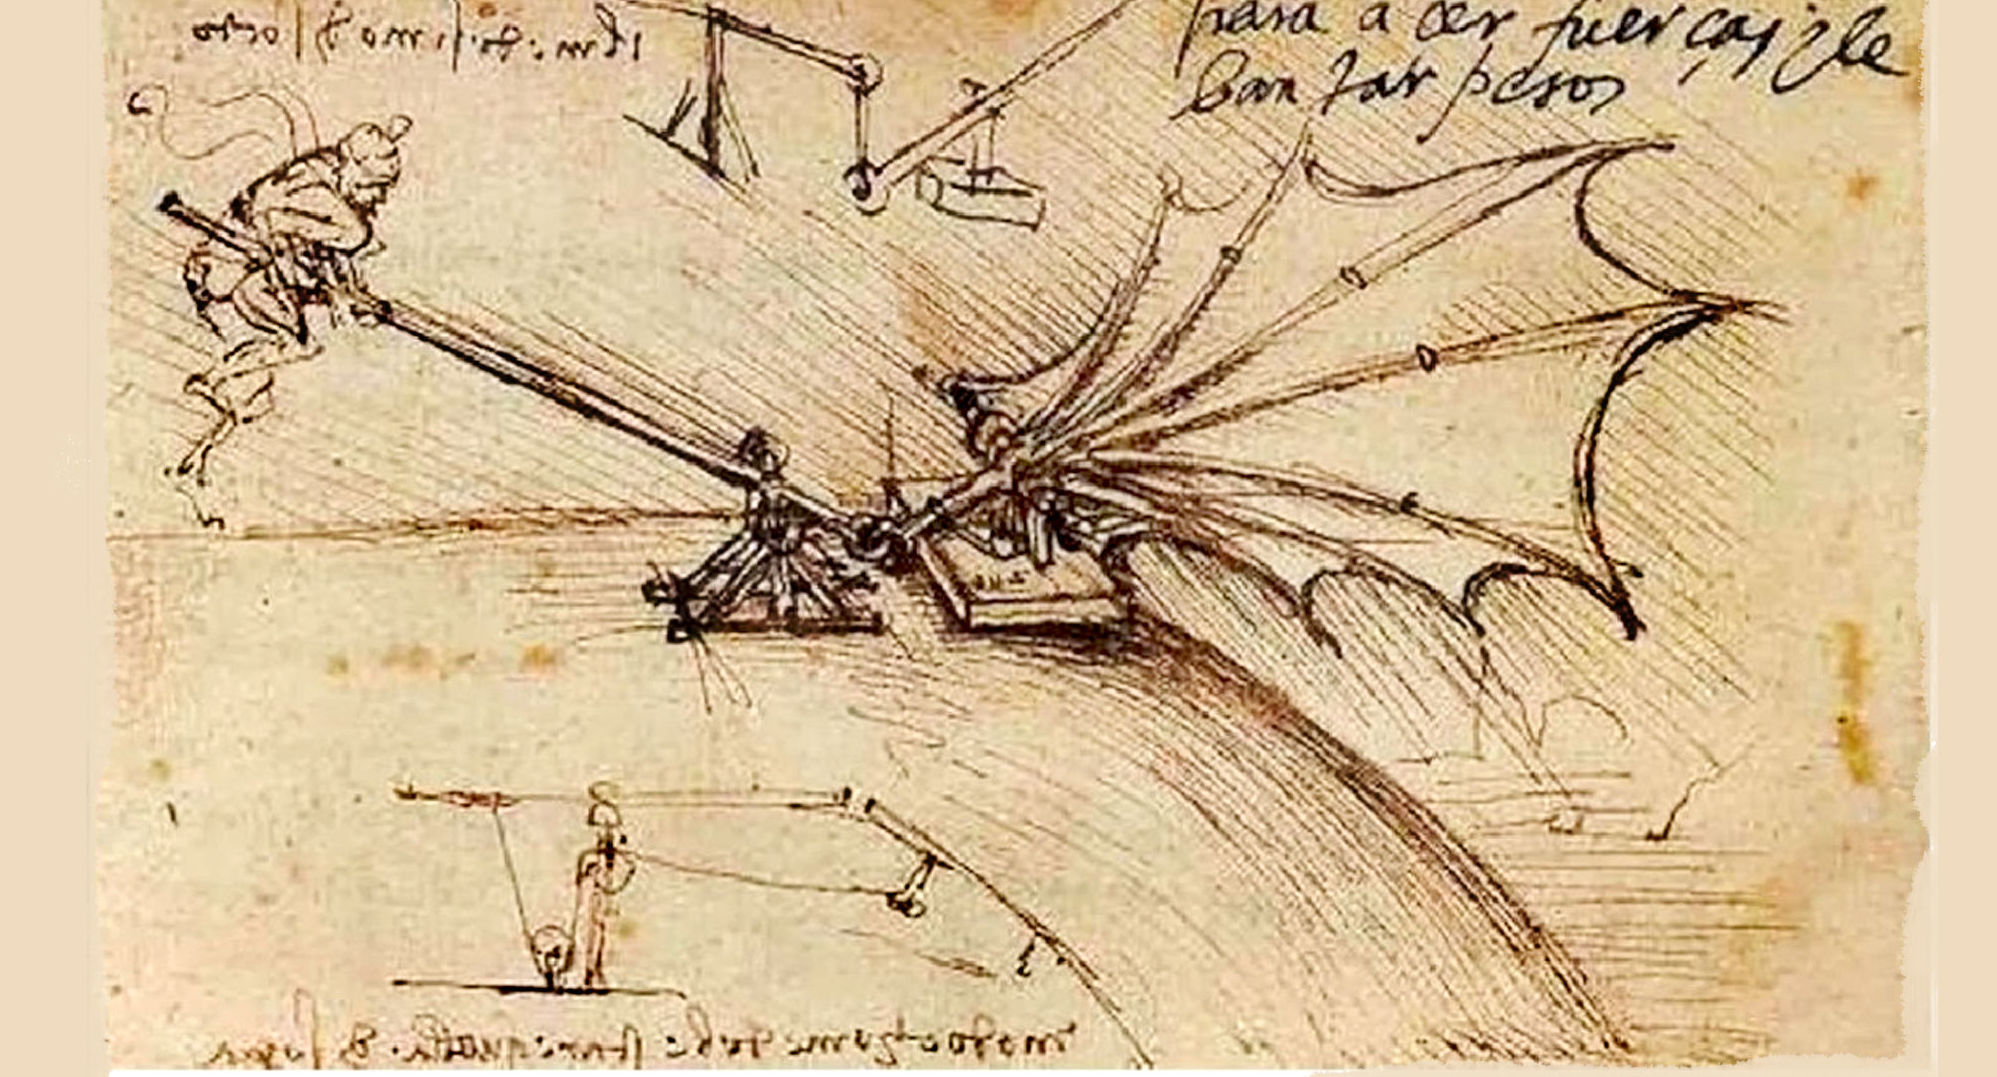 Ala meccanica, esperimento - Manoscritto B, Parigi, Institut de France